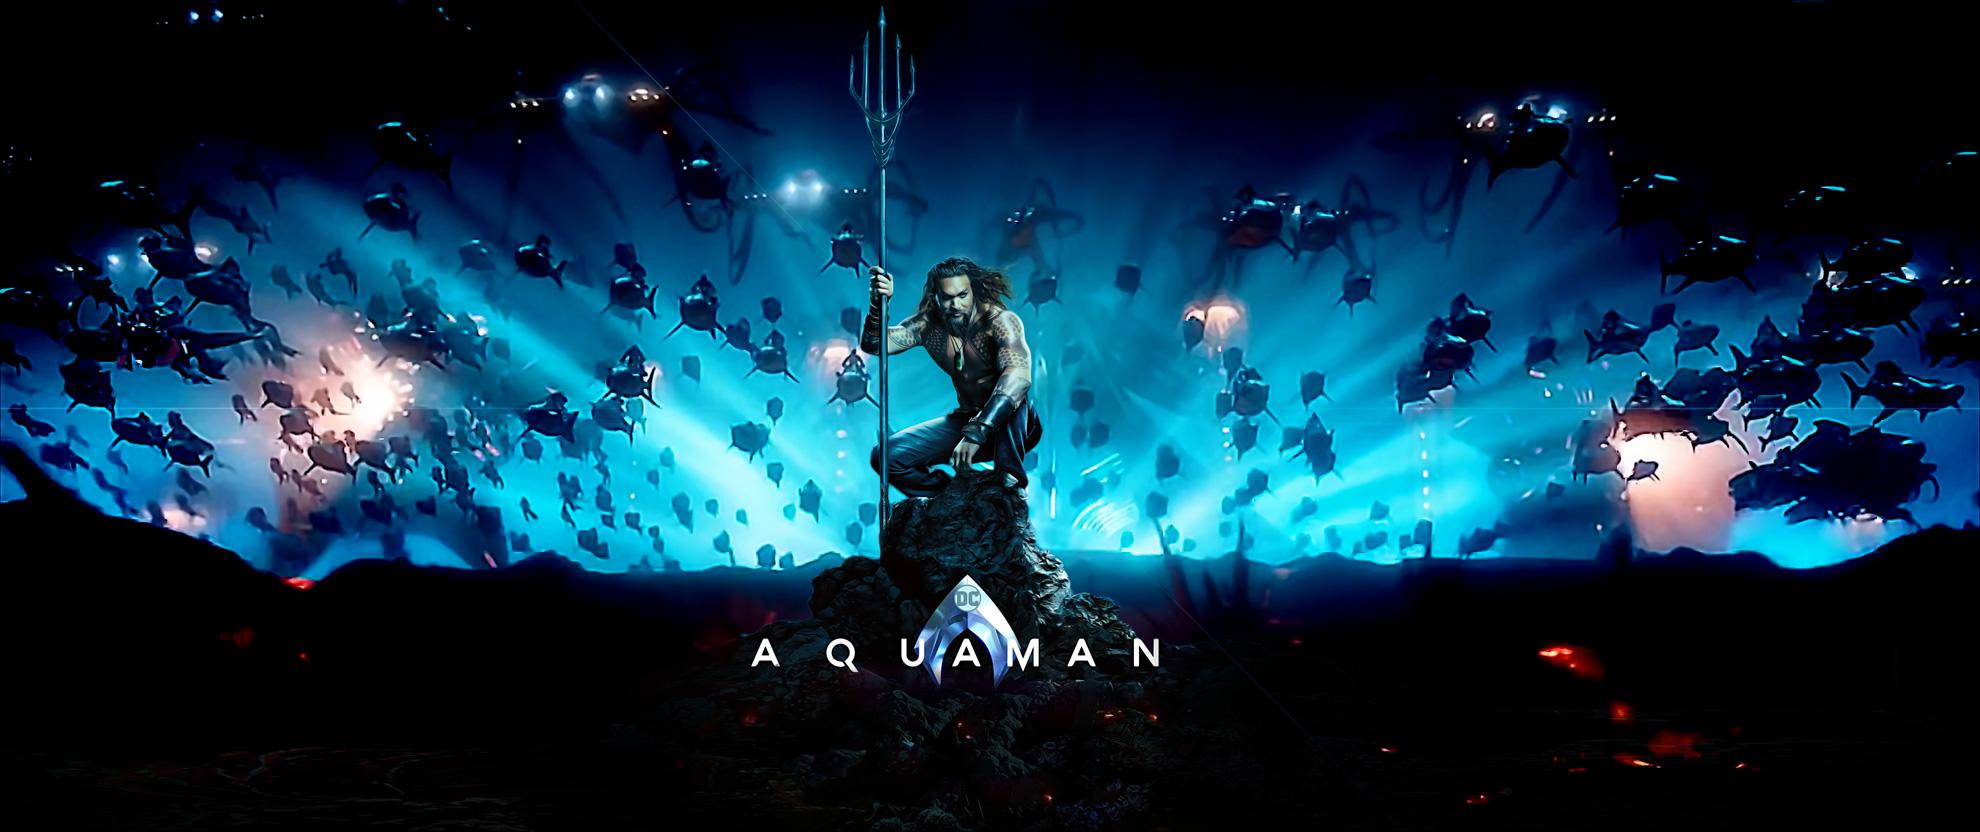 Fondos Aquaman 2018, w...